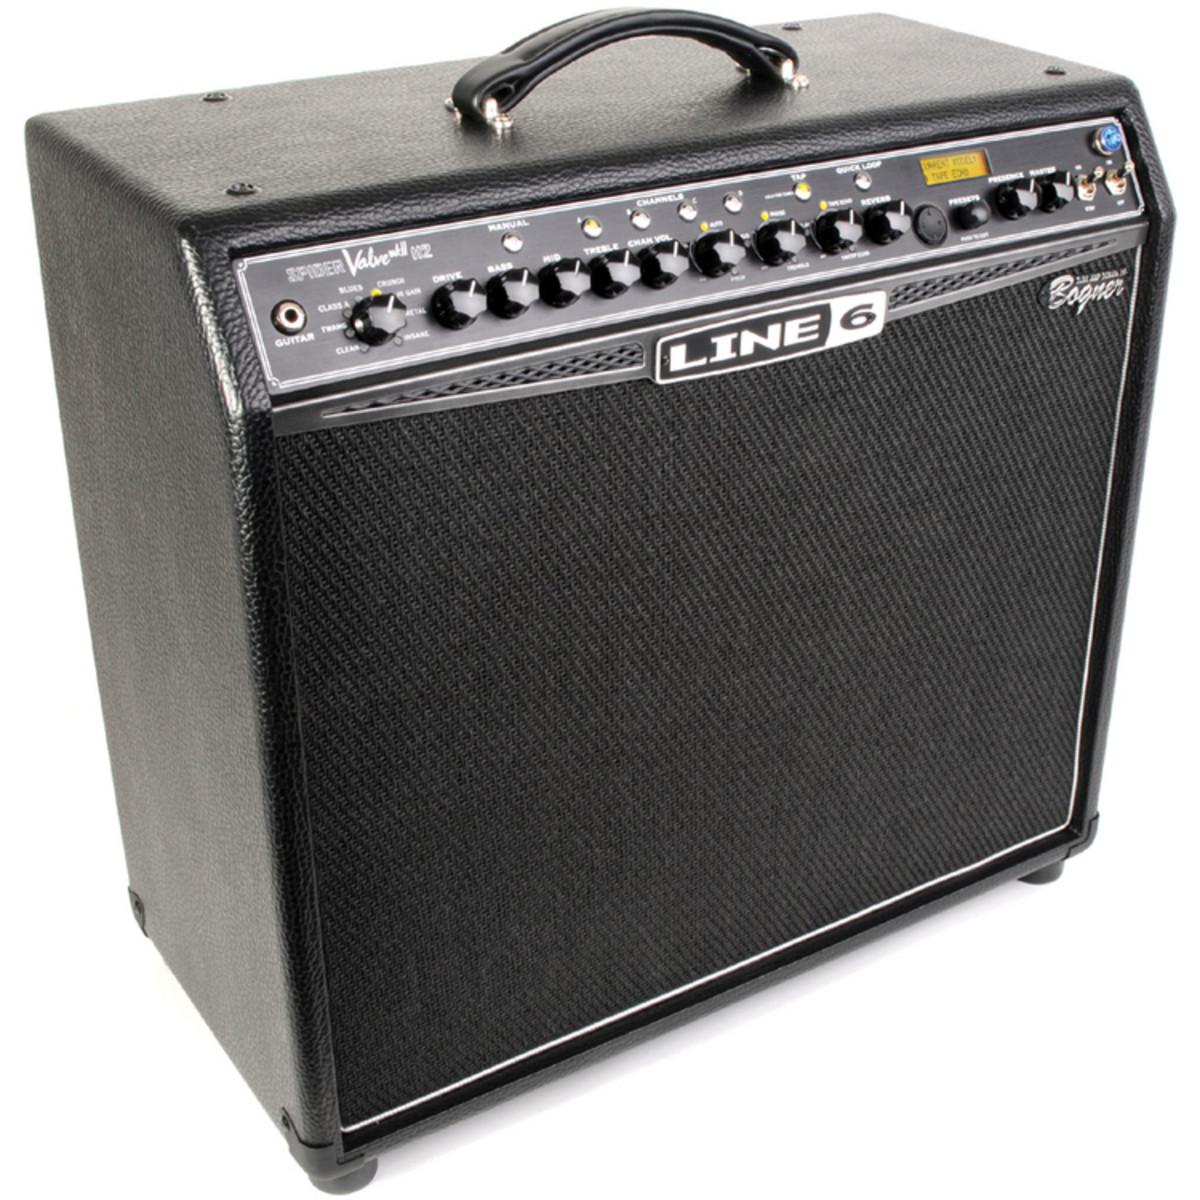 Line 6 Spider Valve 112 MkII 40 Watt 1x12 Guitar. L6SPIDERVMK2. Loading zoom